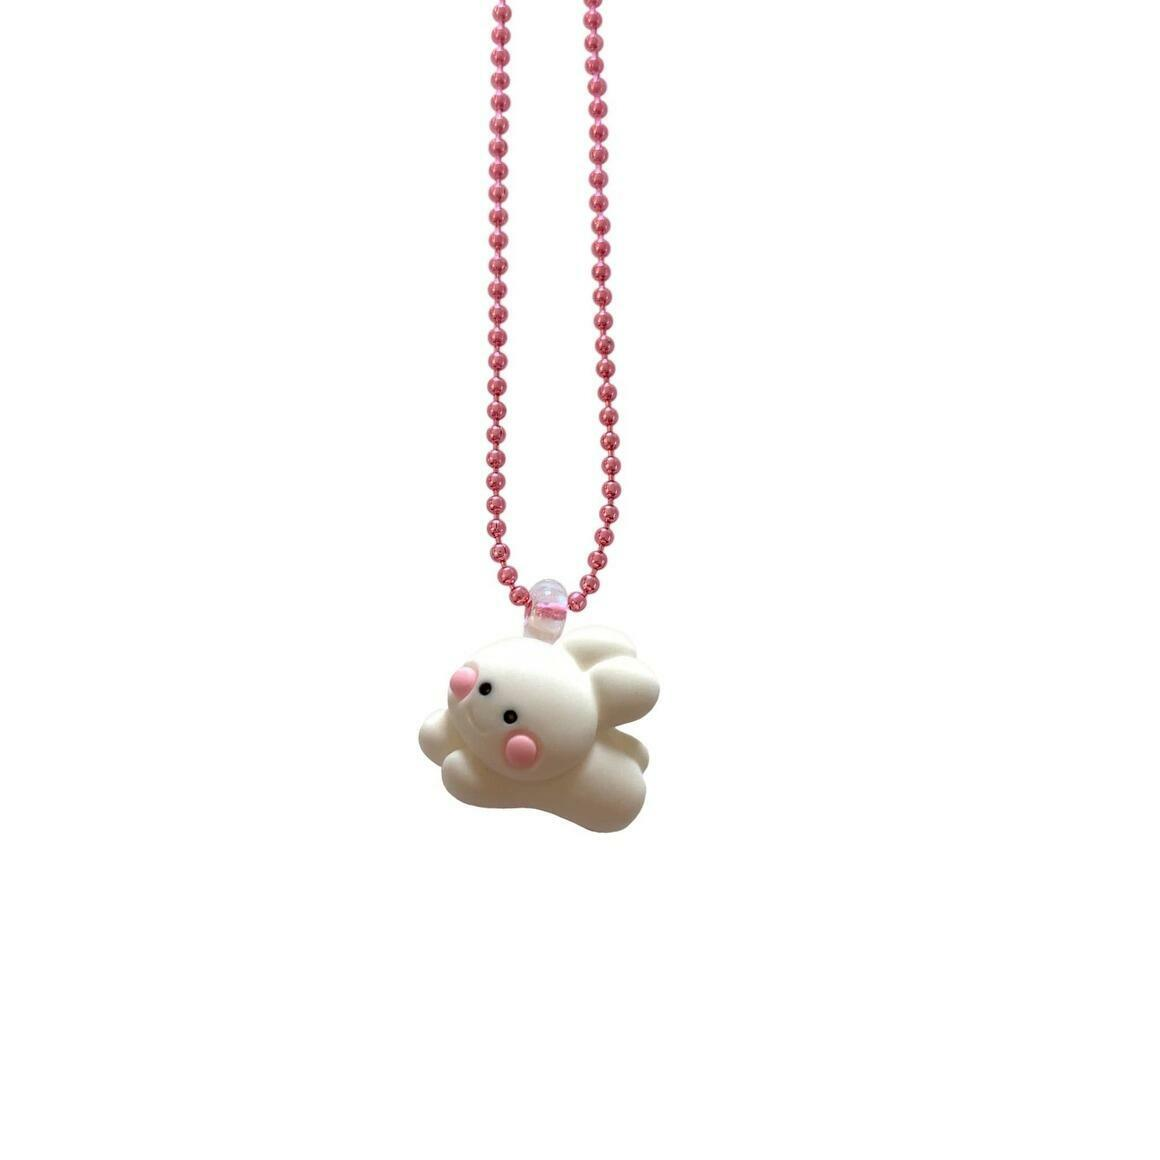 Pop Cutie Gacha Fluffy Bunny Kids Necklaces - Easter | Trada Marketplace